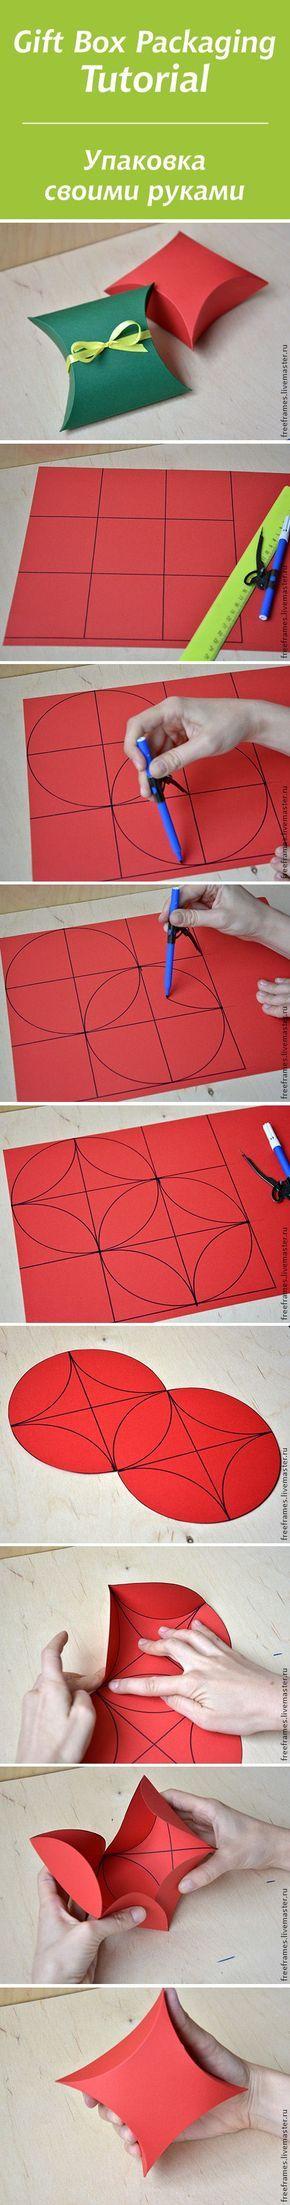 Упаковка своими руками / Gift Box Packaging Tutorial pack packaging